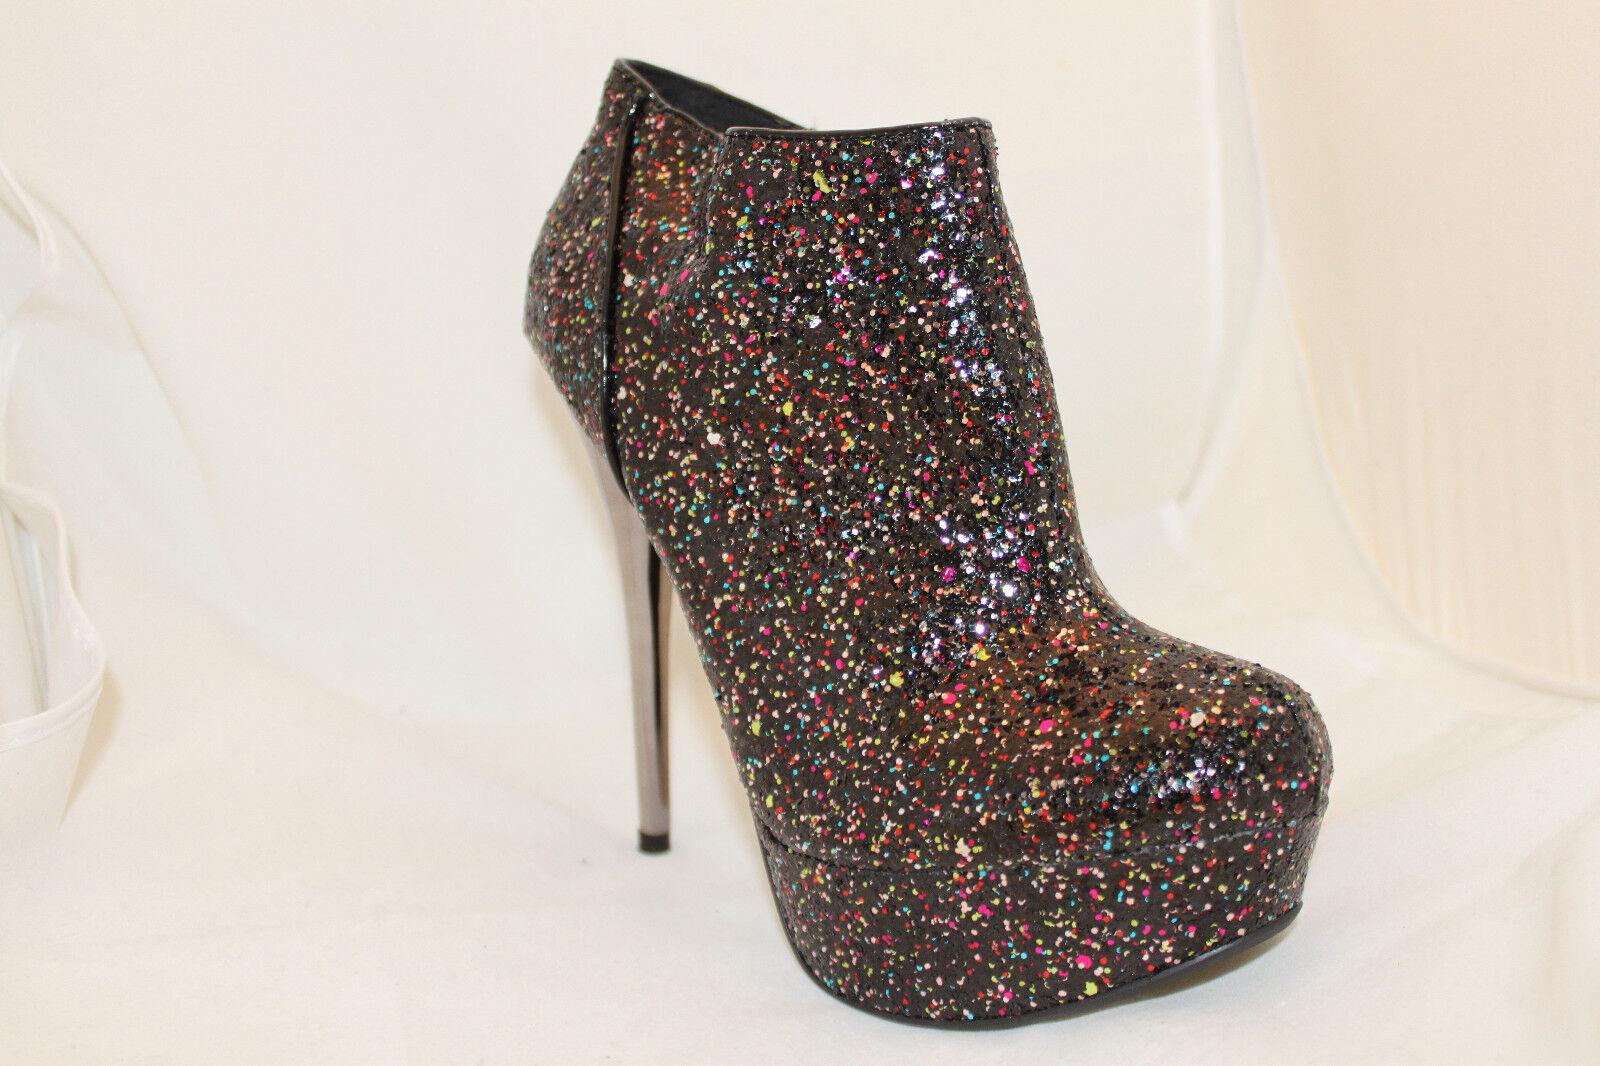 Stiletto Ankle Booties Stylish Glittery Boots Black Metallic Heels Women's Shoes